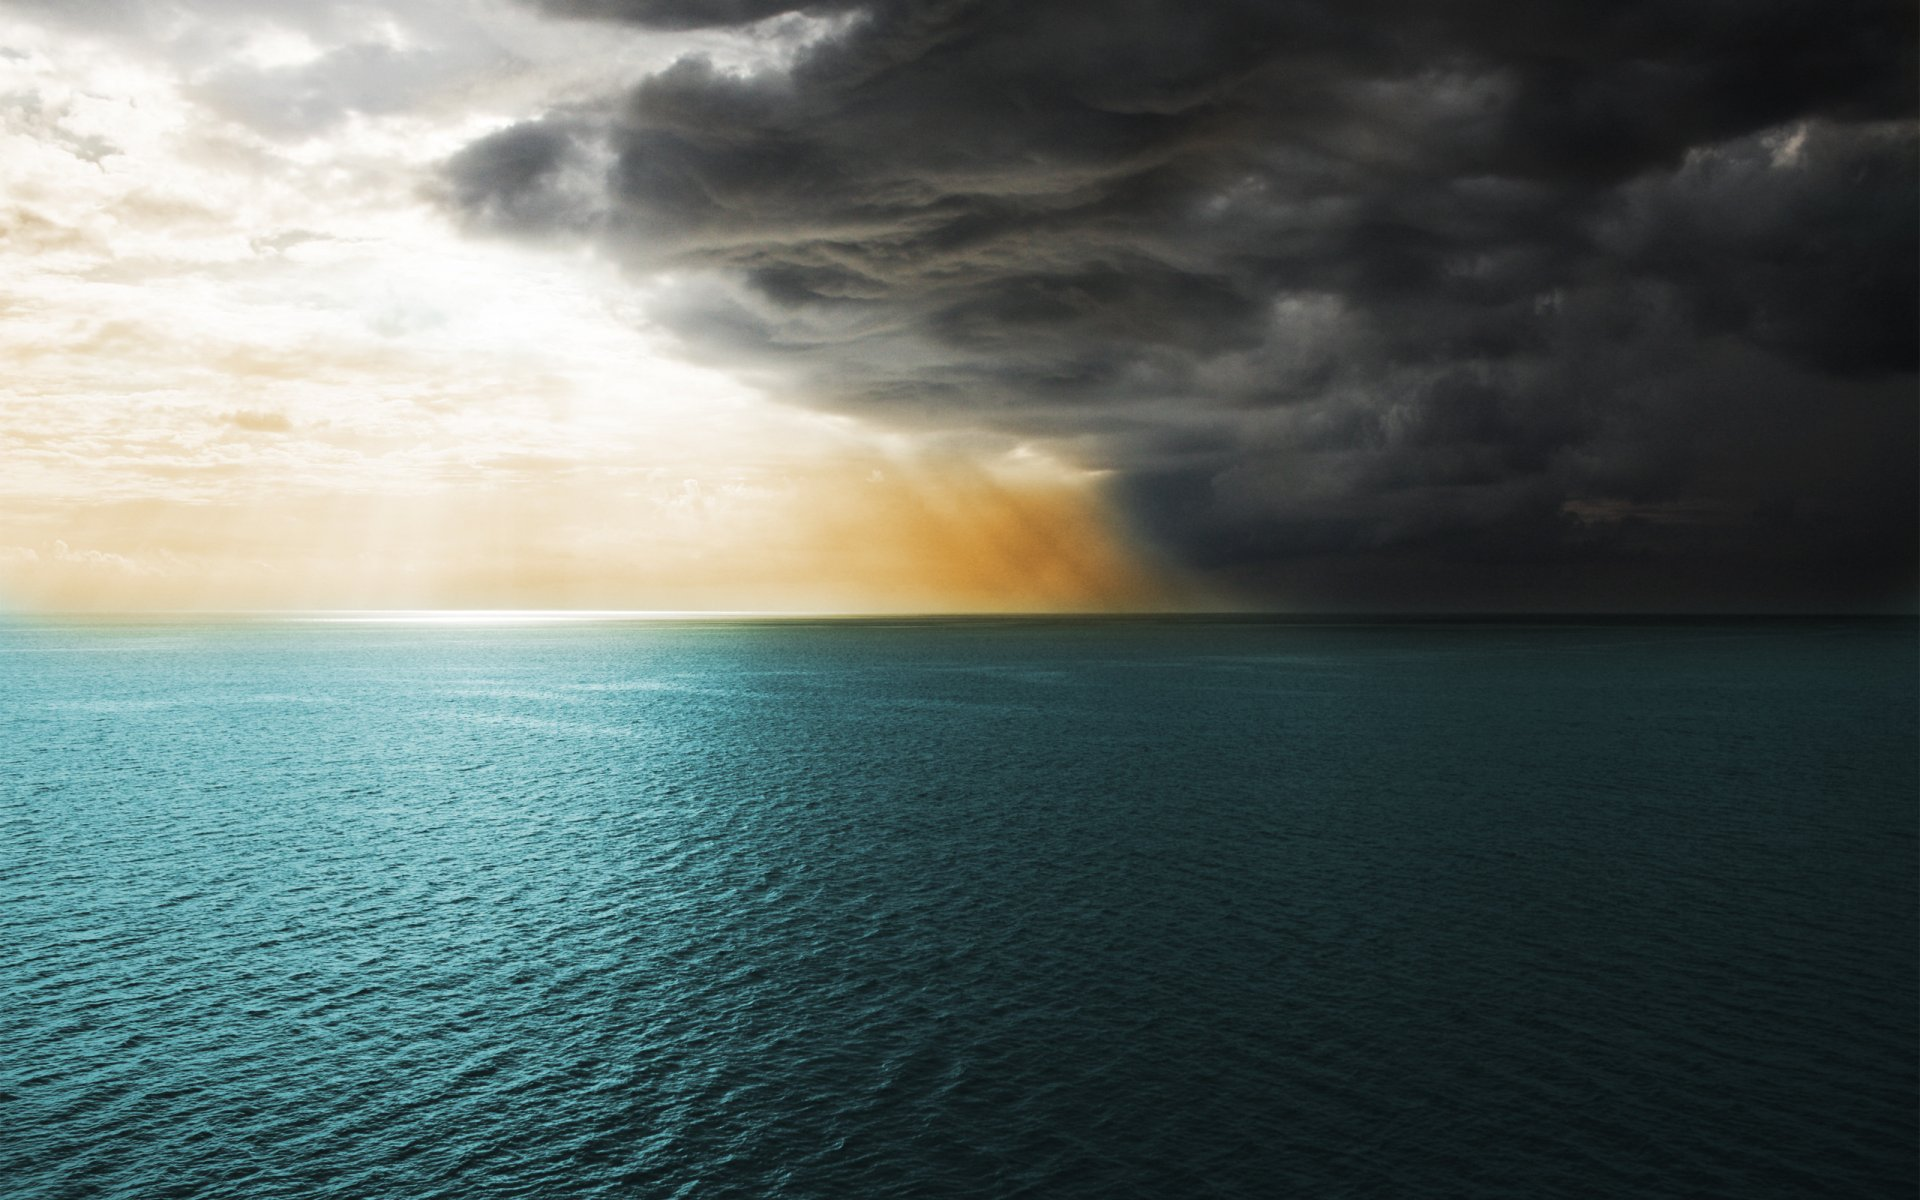 Обои Вода, Облака. Пейзажи foto 10